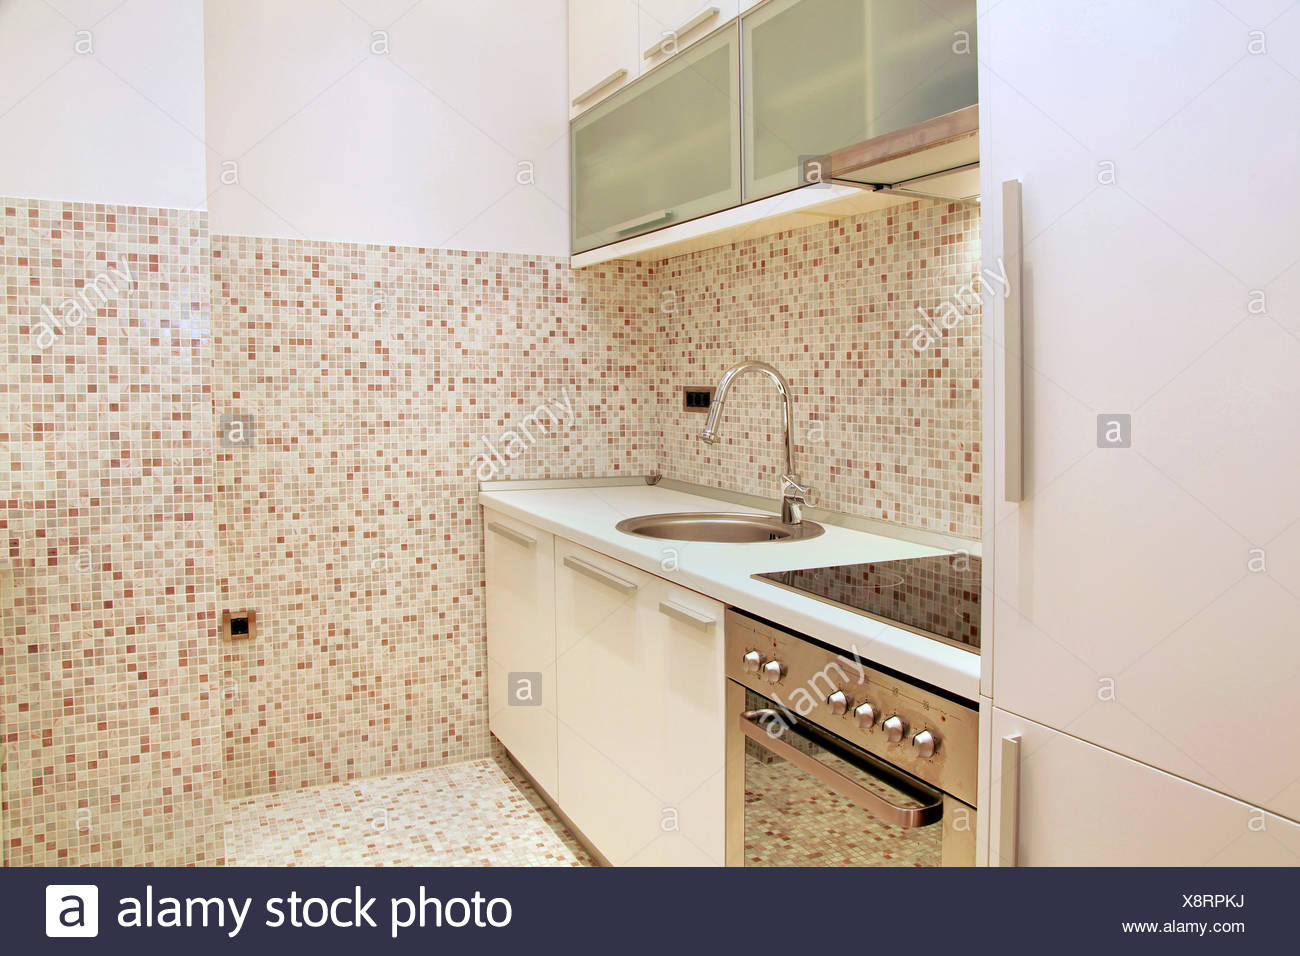 Mosaik Fliesen Küche Stockfoto, Bild: 280805830 - Alamy